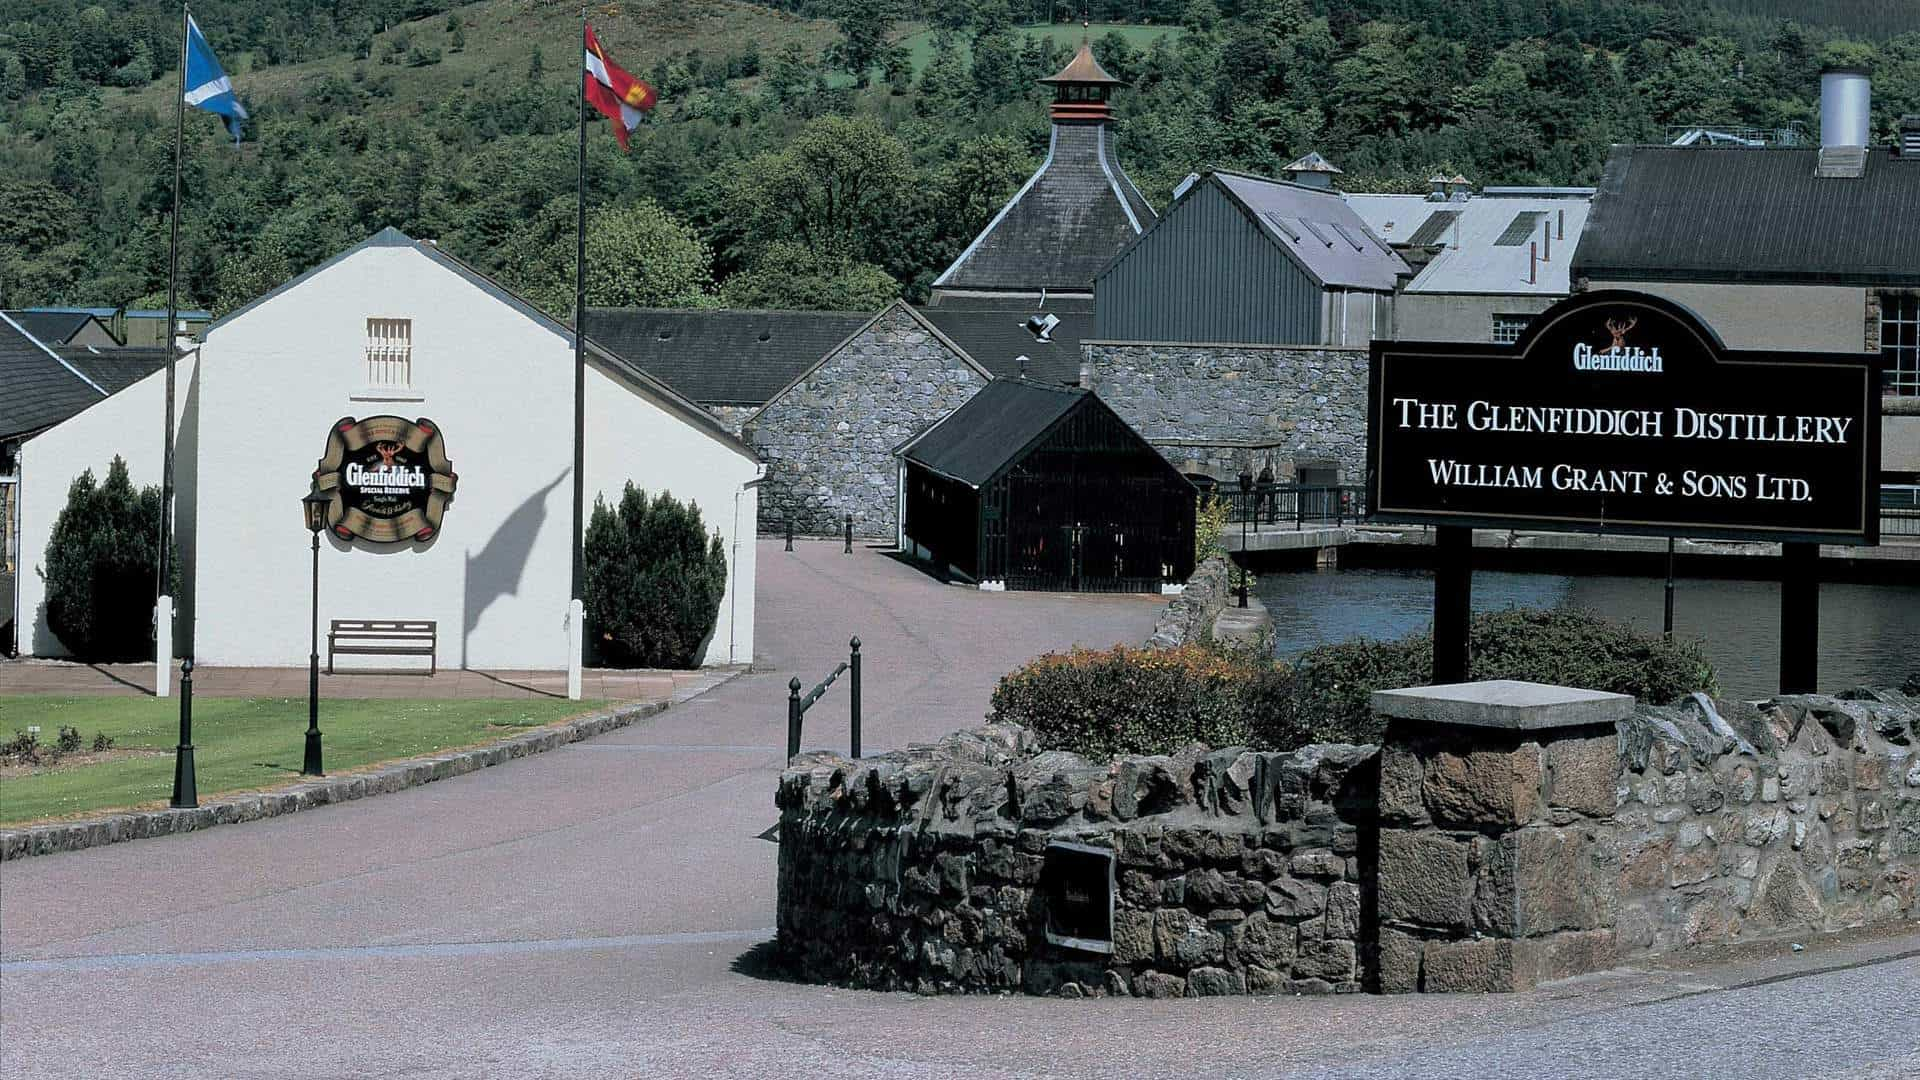 Glenfiddich Distillery Tours